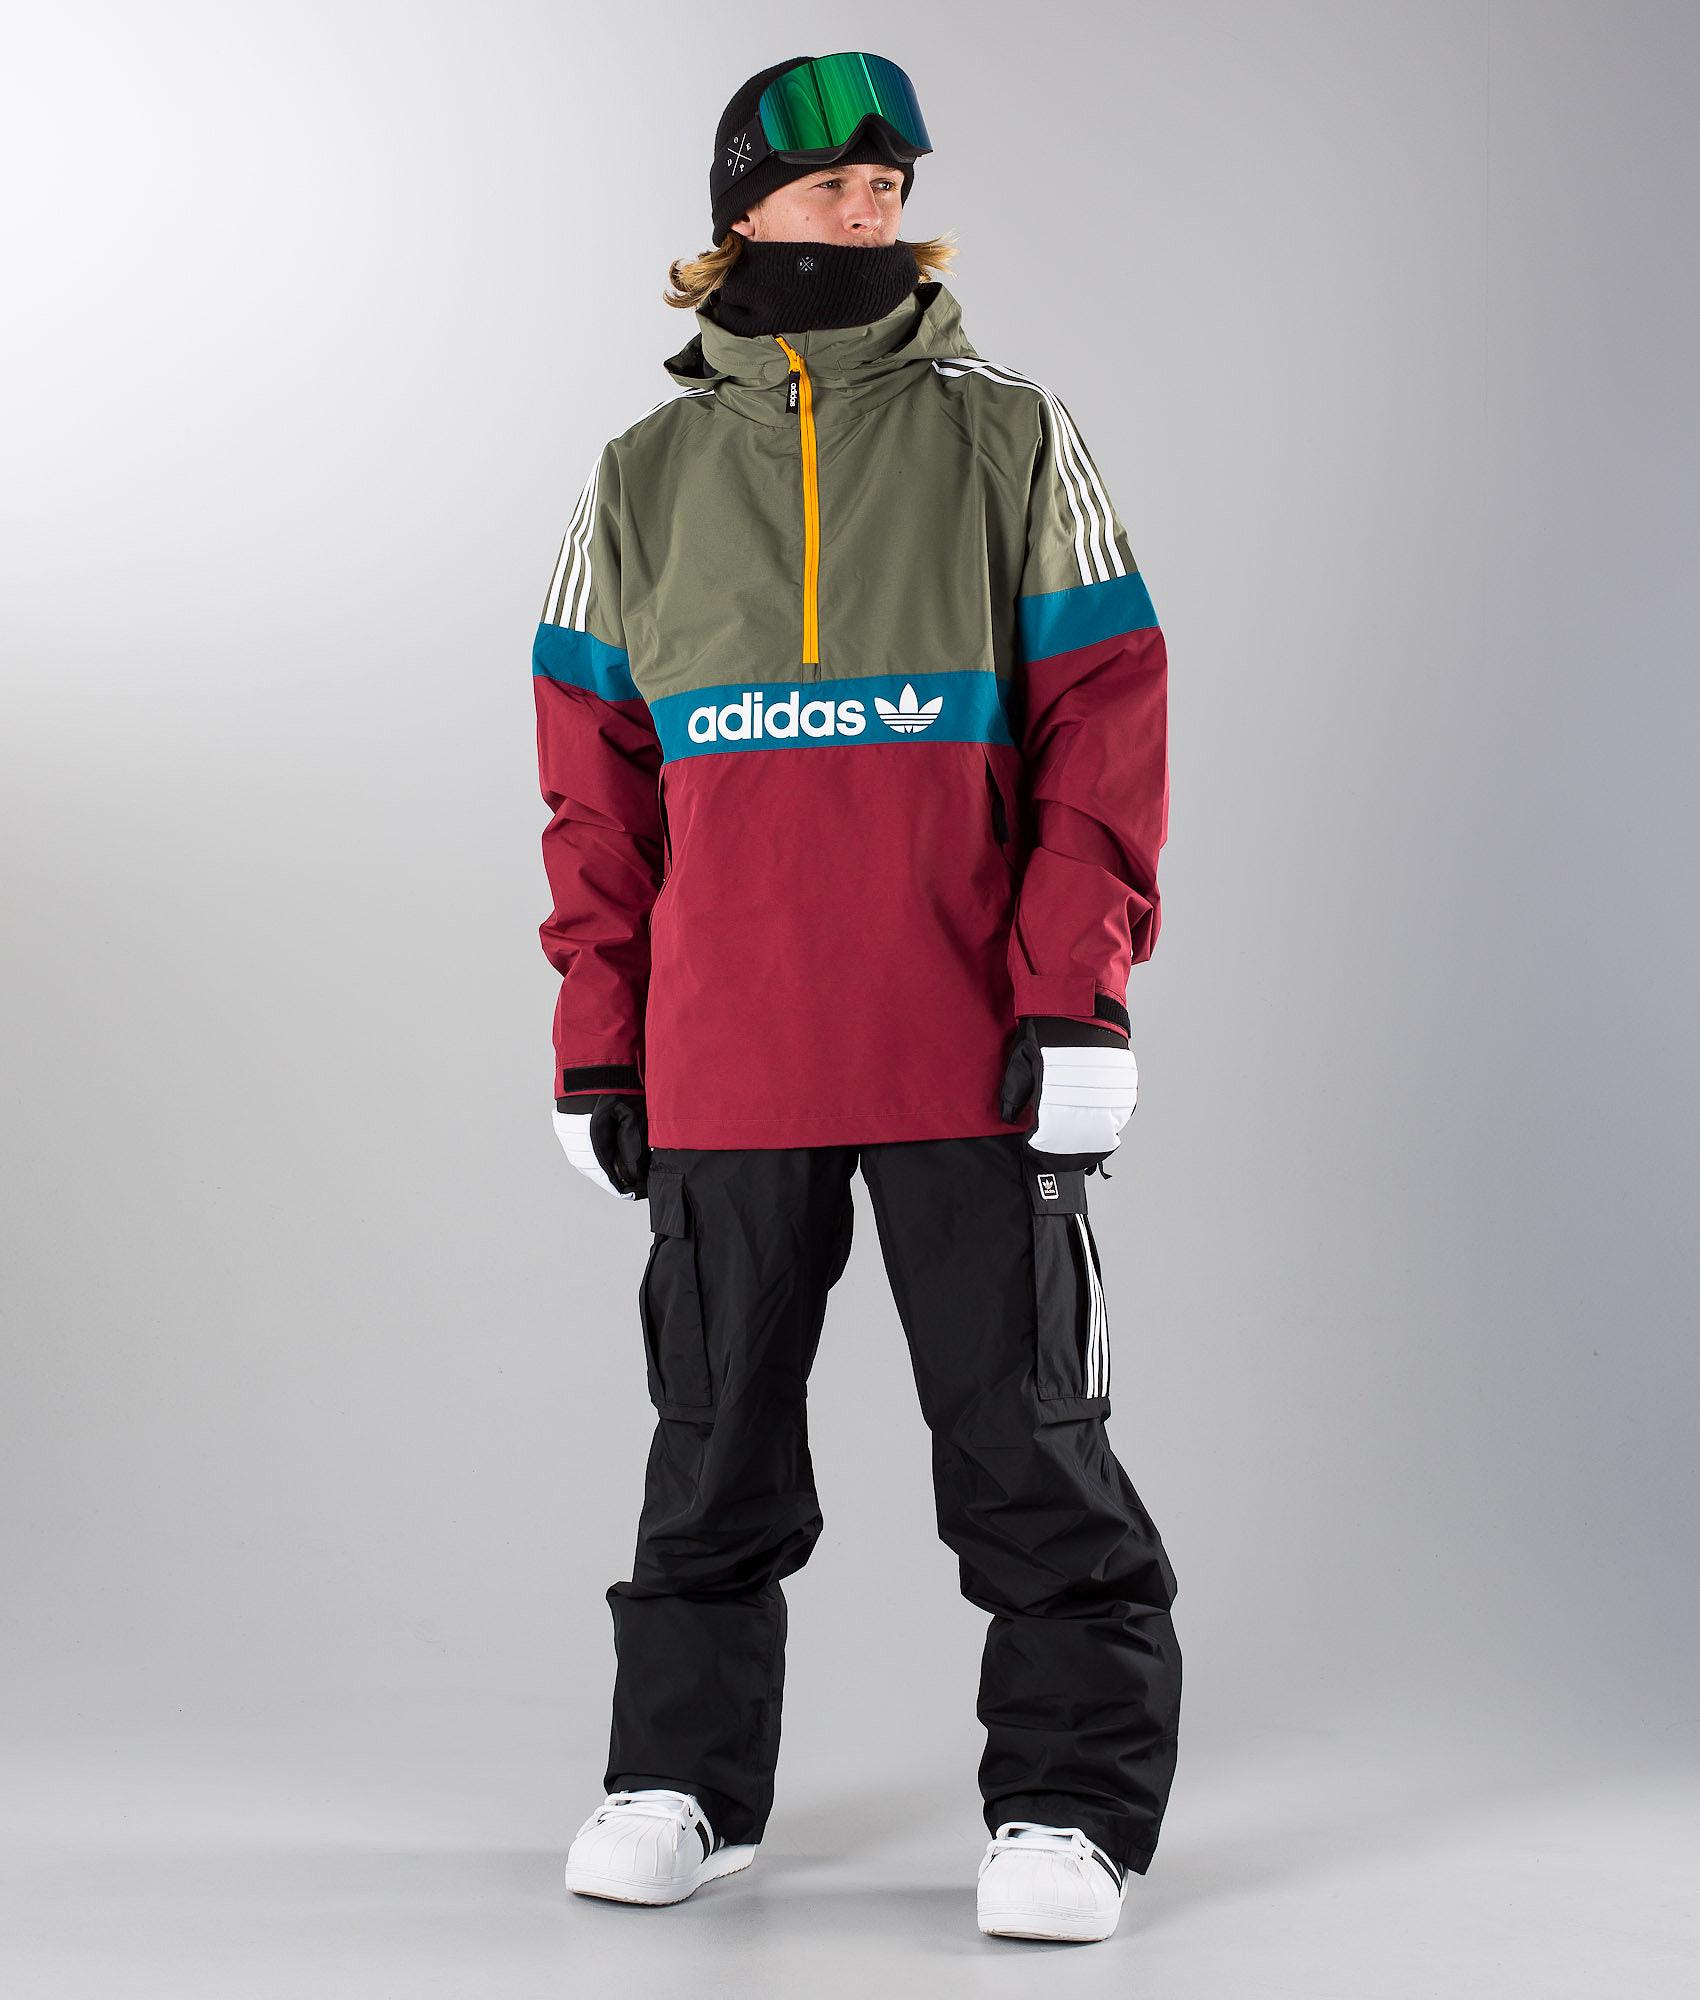 Adidas Snowboarding Blackbird Snowboardjacke Noble Maroon Base Green ... 58960e35af